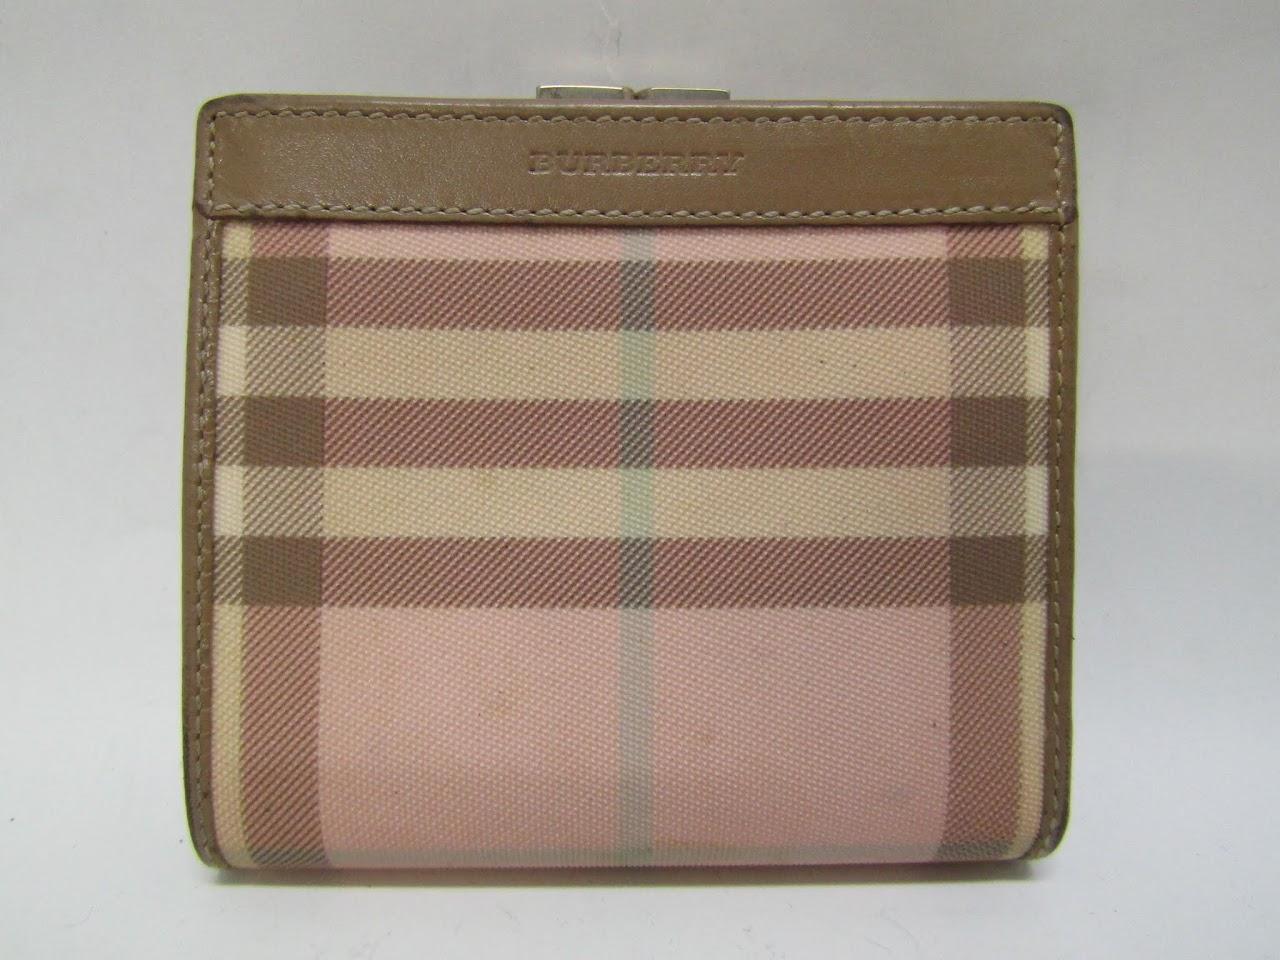 Burberry Plaid Wallet